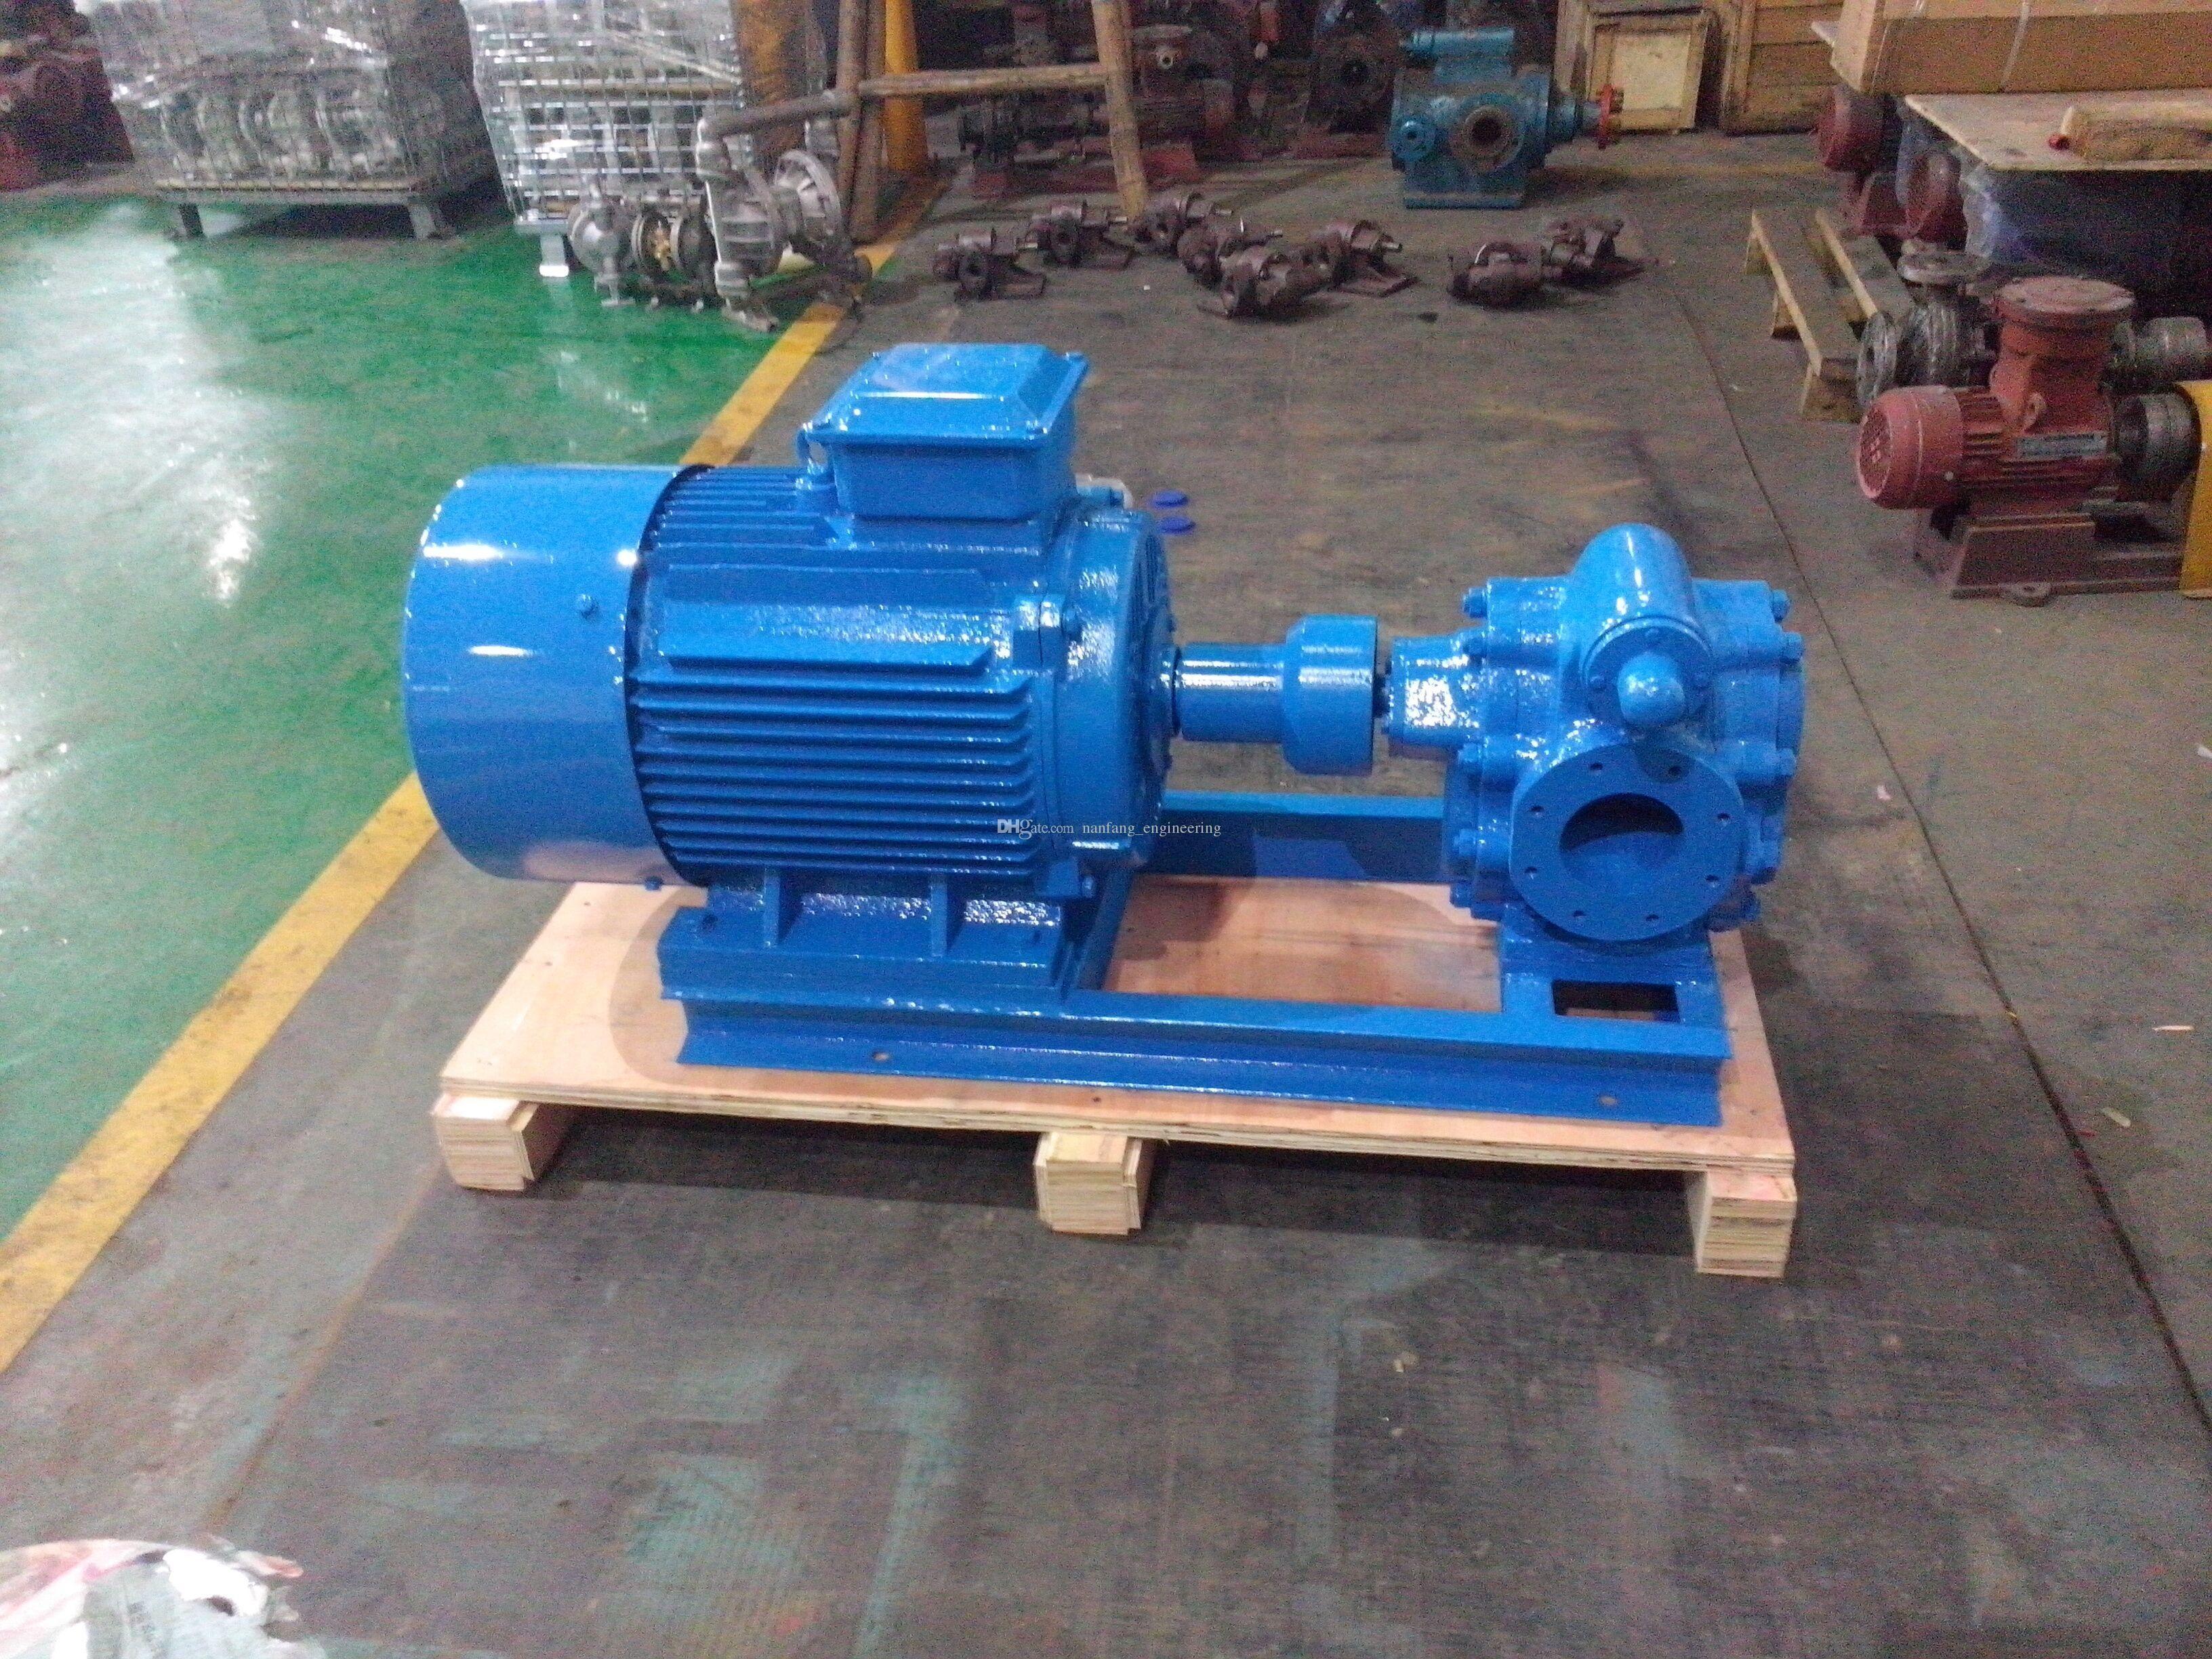 Kcb633 Double Gear Pump Electric Fuel Oil Transfer Pump Gear Pump Fuel Oil Pumps